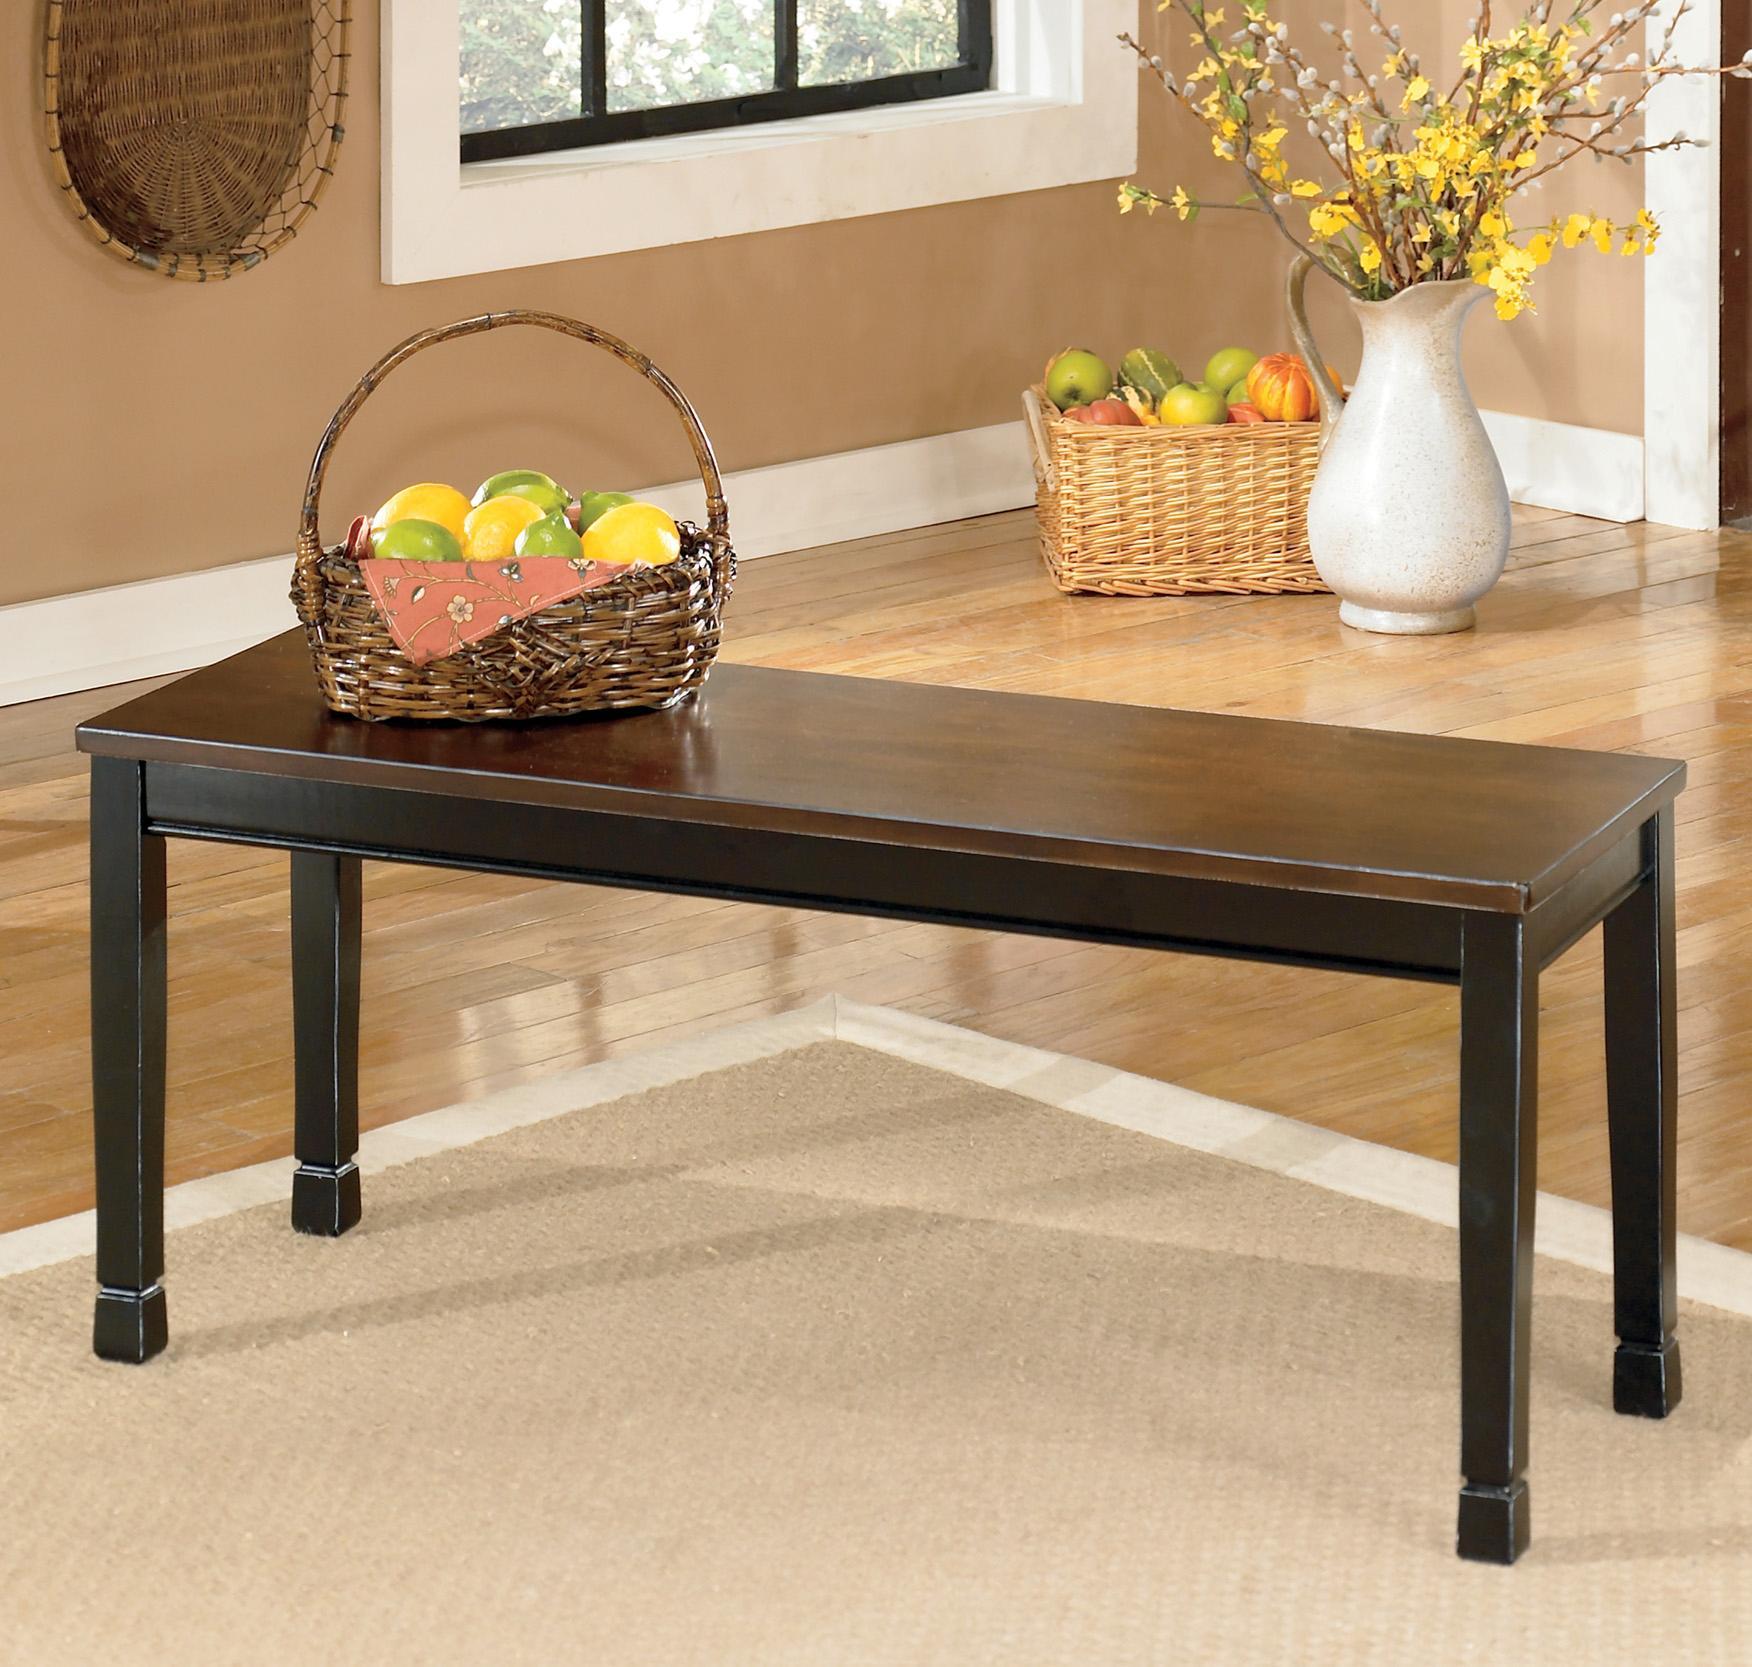 Owingsville Large Dining Room Bench by StyleLine at EFO Furniture Outlet